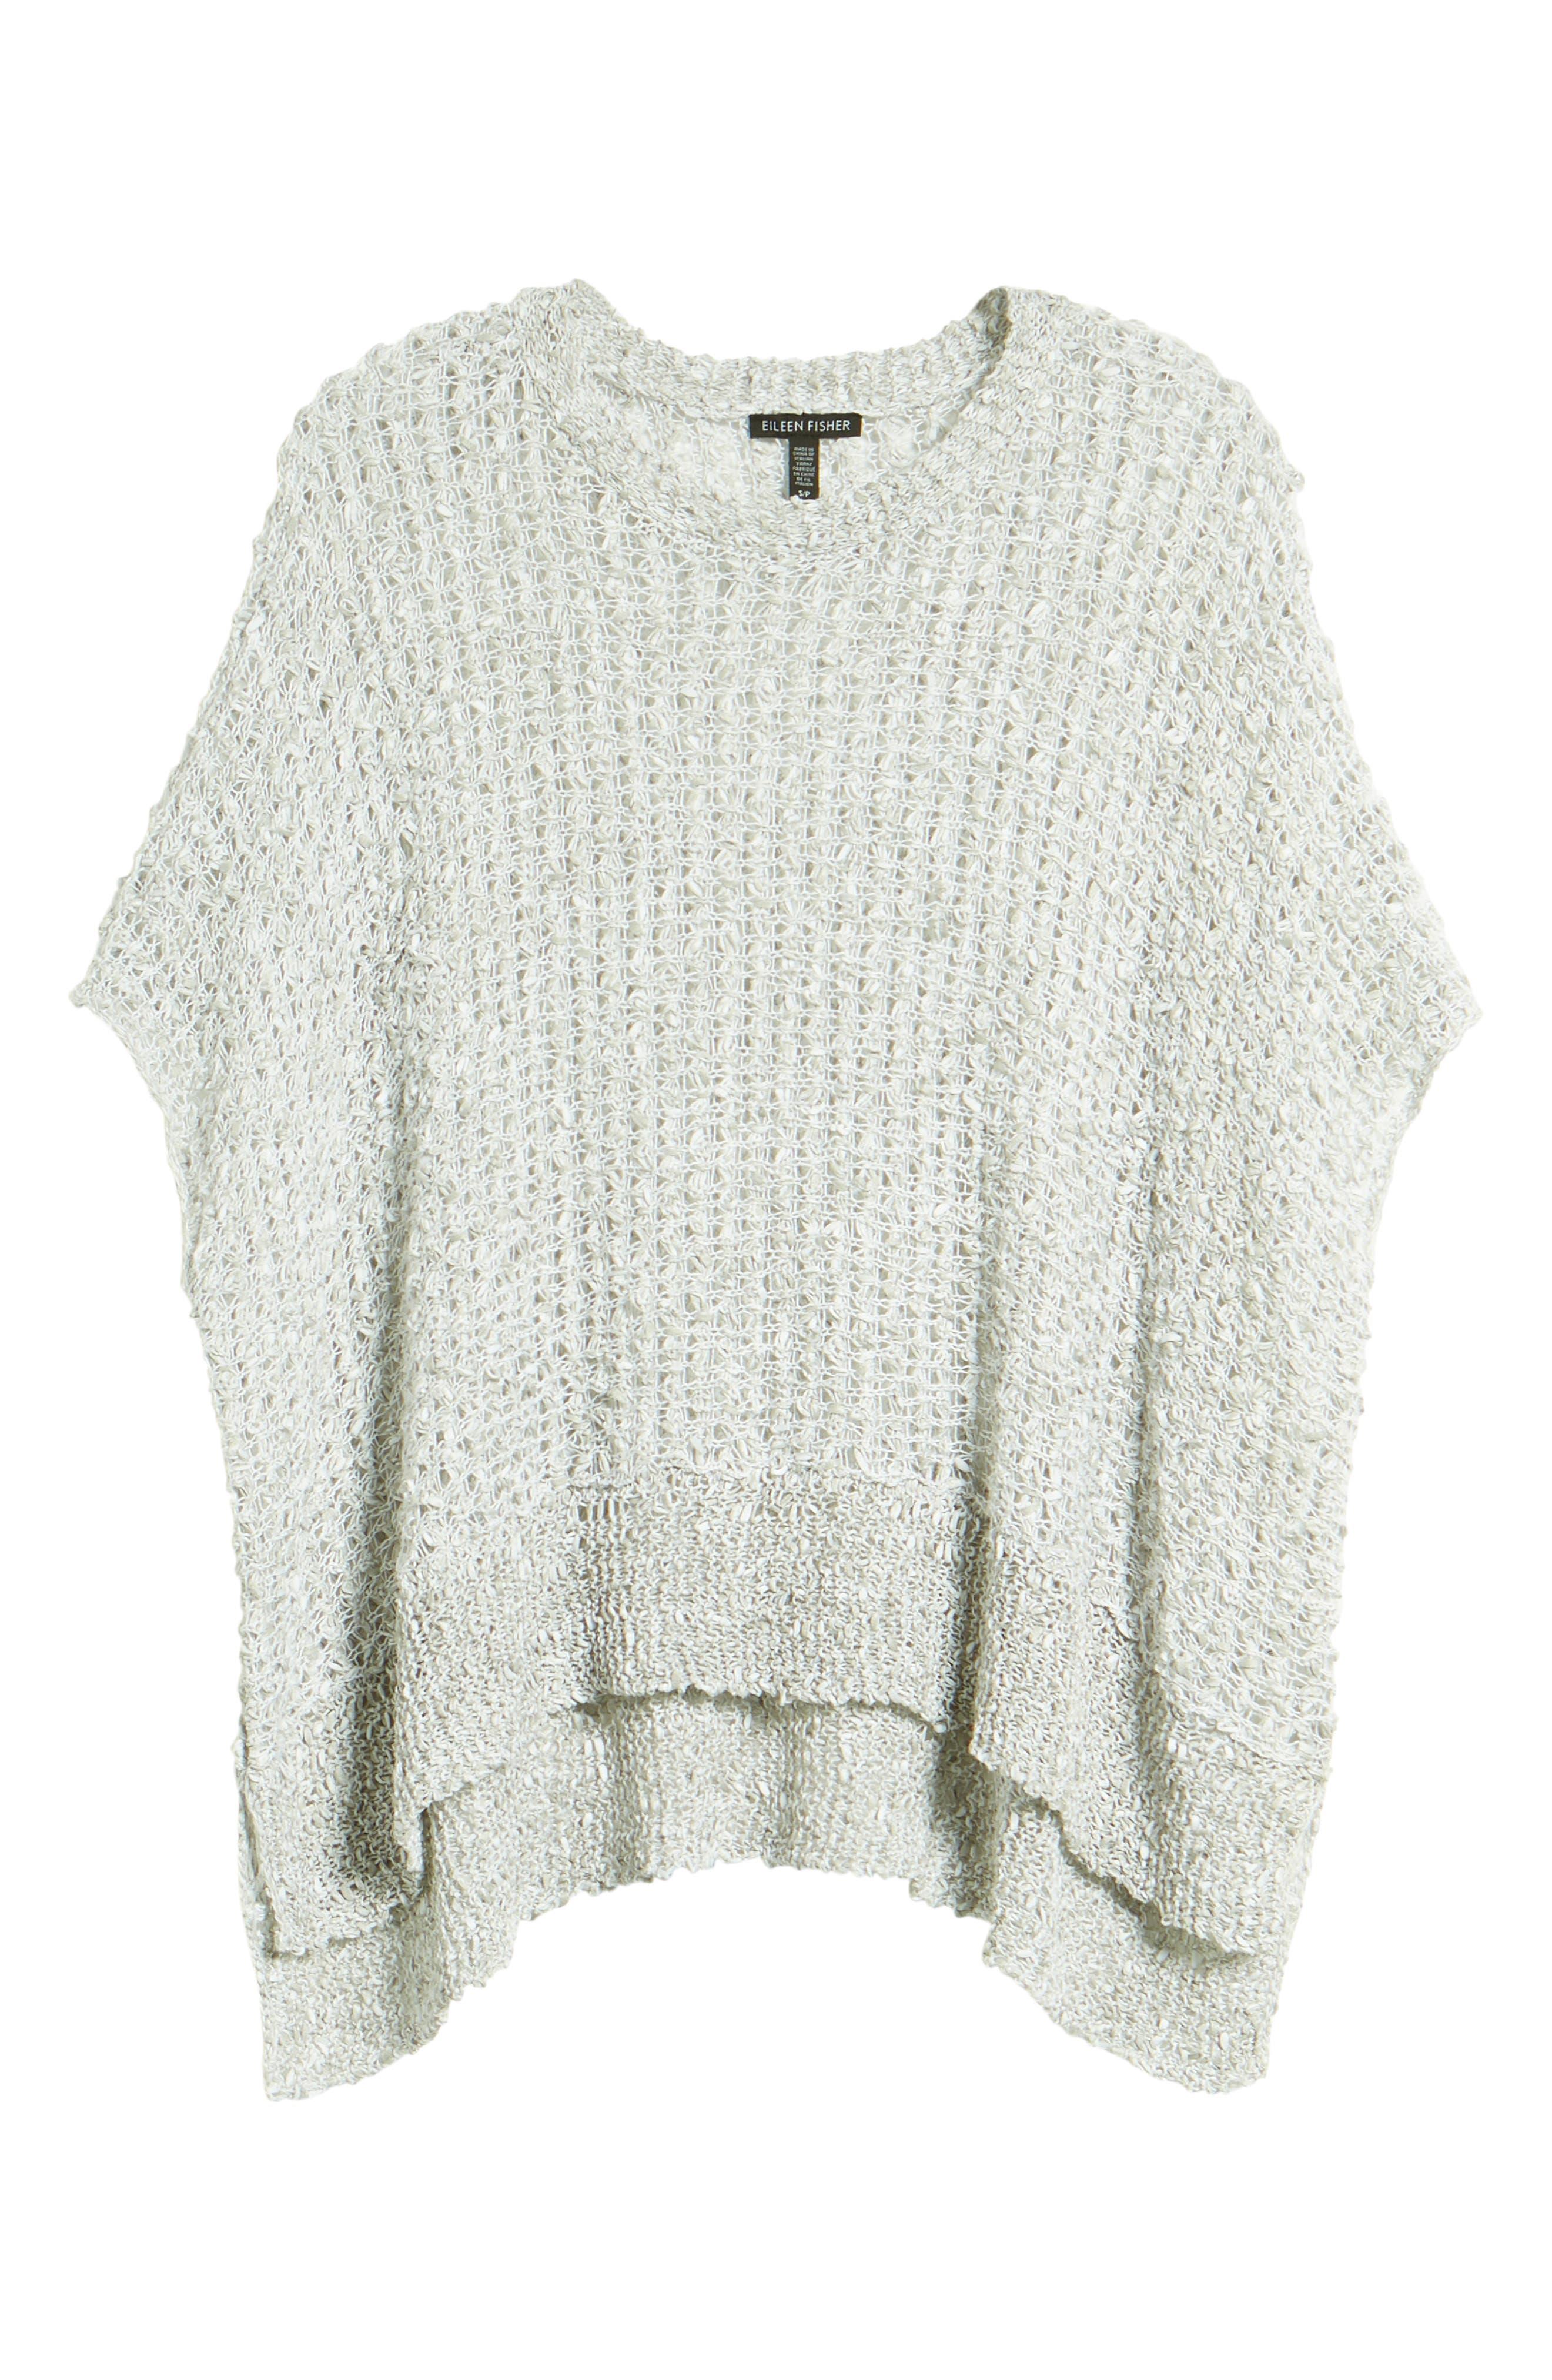 Organic Cotton & Linen Crochet Top,                             Alternate thumbnail 7, color,                             022